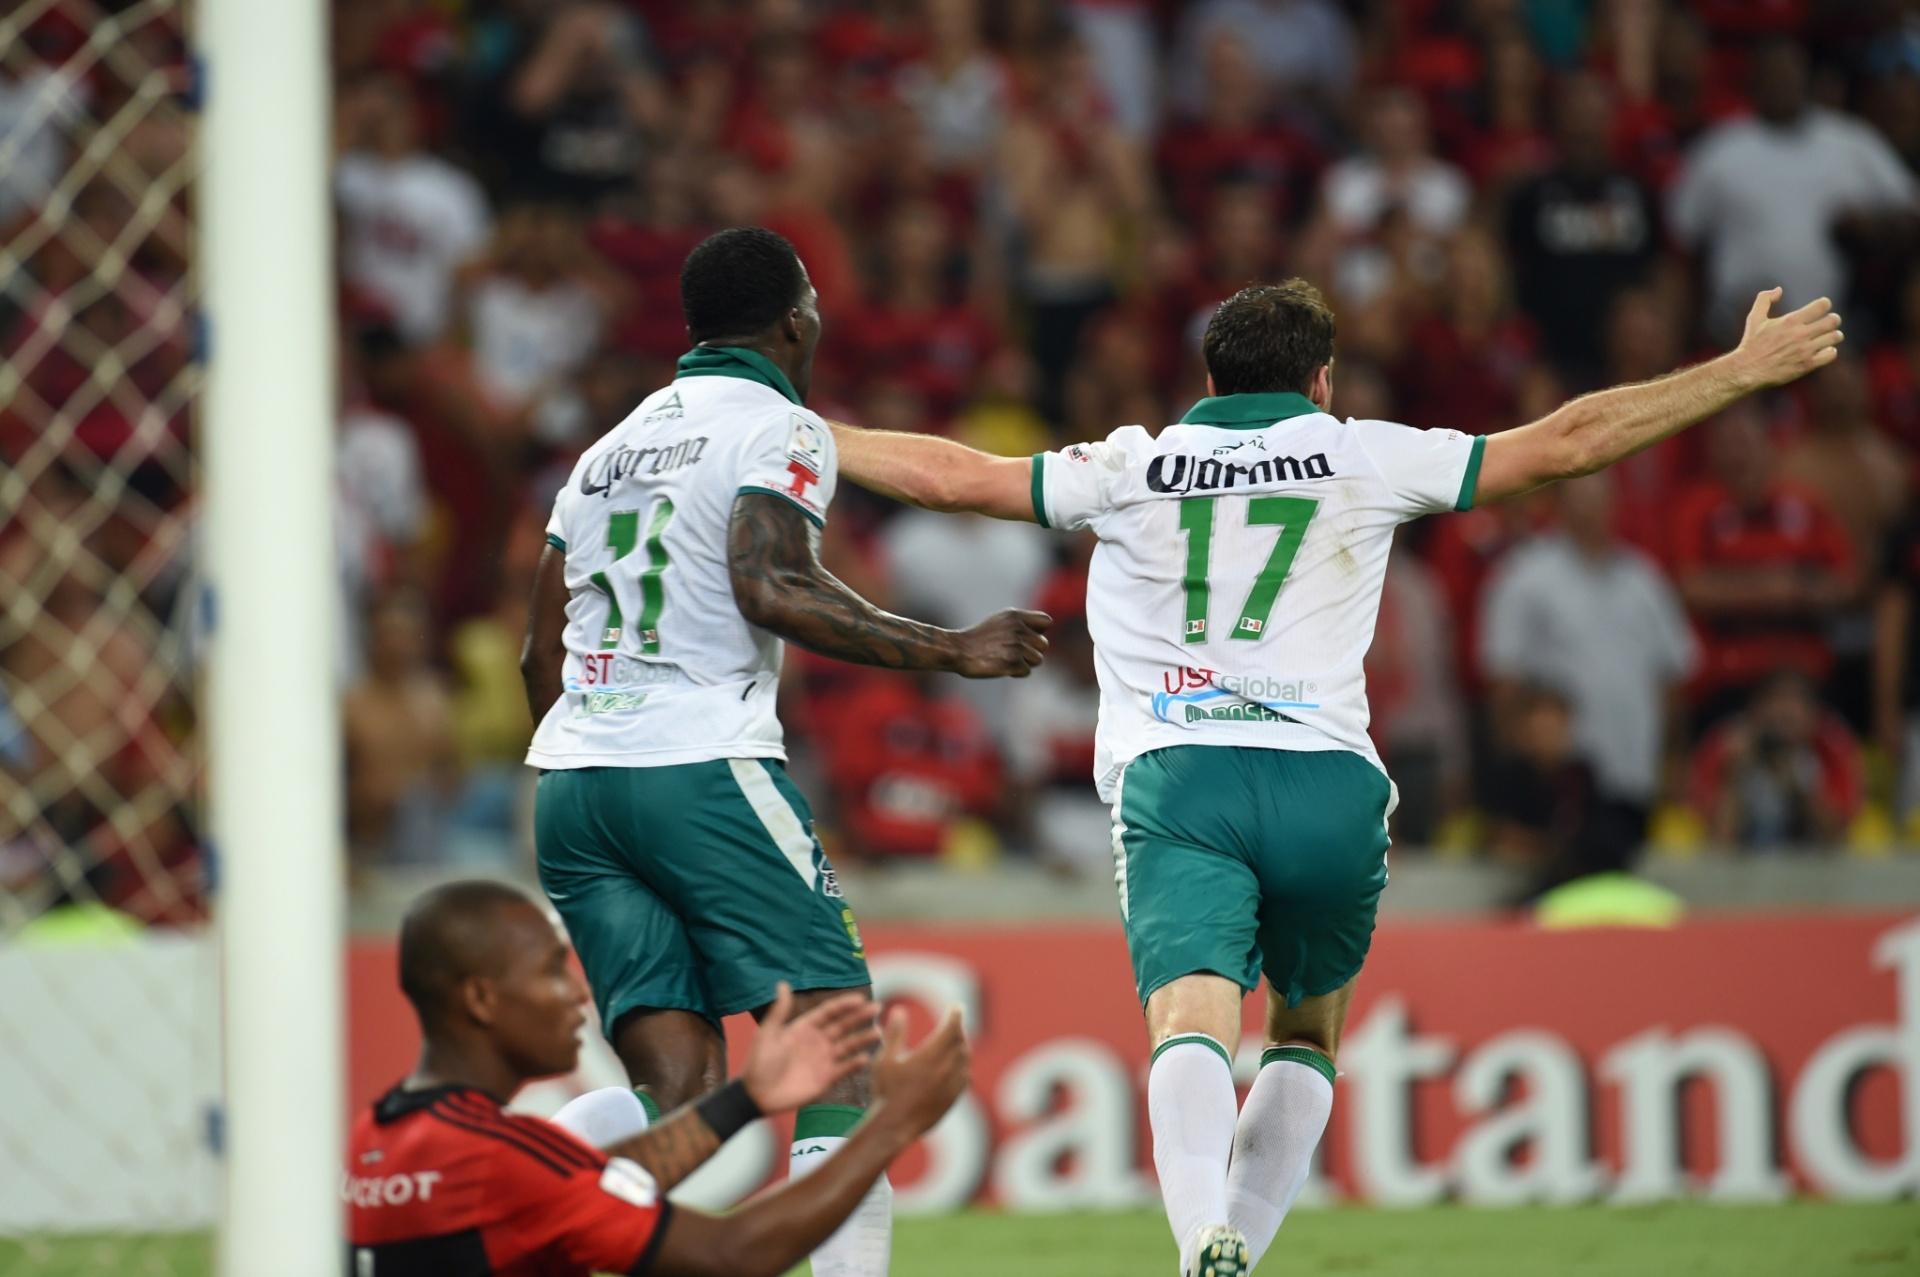 09.04.2014 - Boselli celebra segundo gol marcado pelo Leon na partida contra o Flamengo pela Libertadores